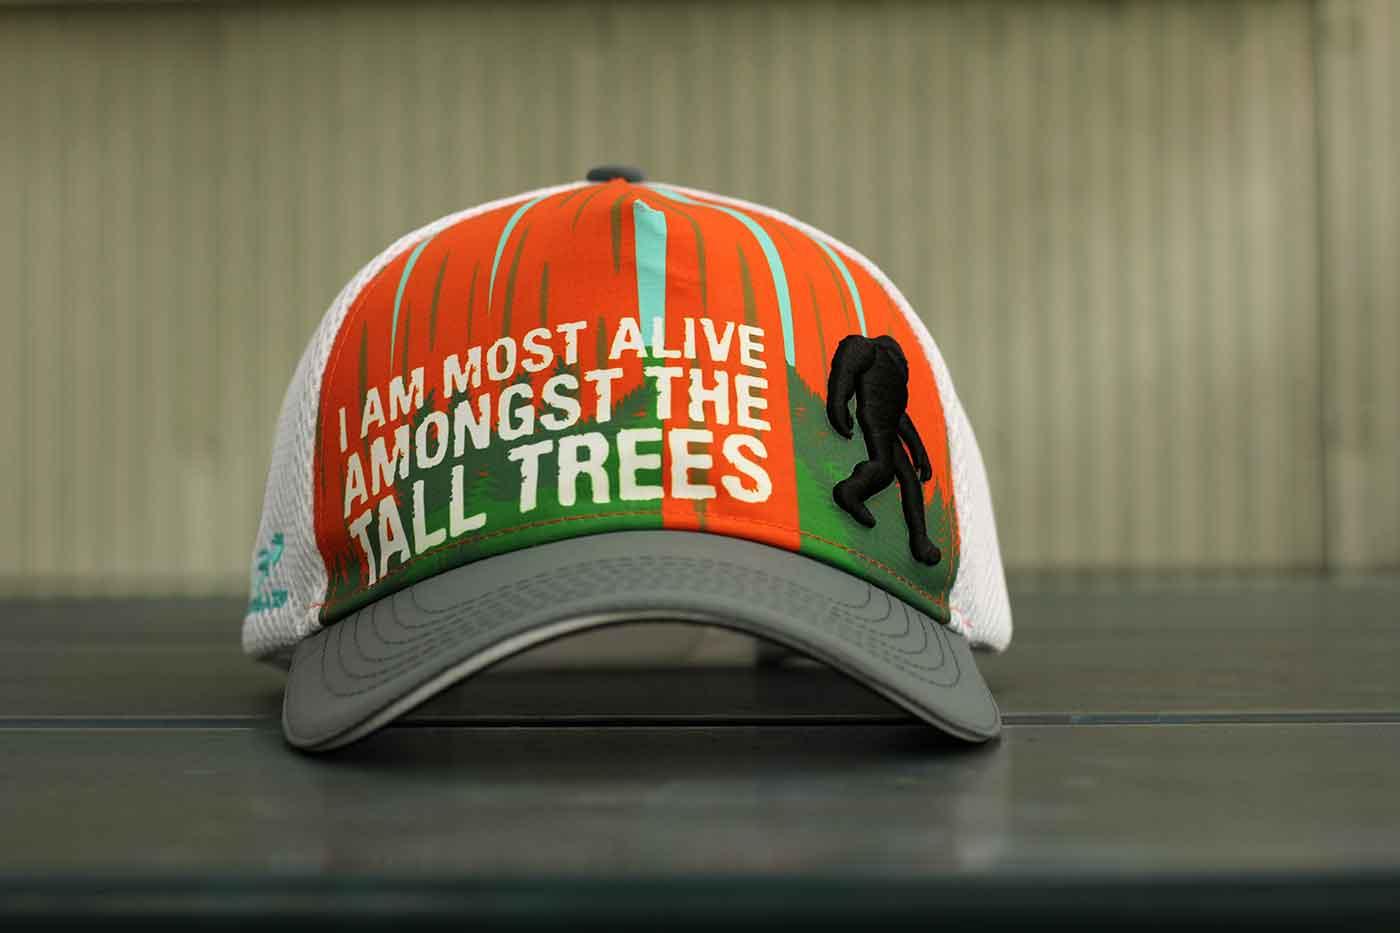 Trucker Hat Outdoors  Headsweats Builds  Performance  Option ... 9b4cbf5e5d6